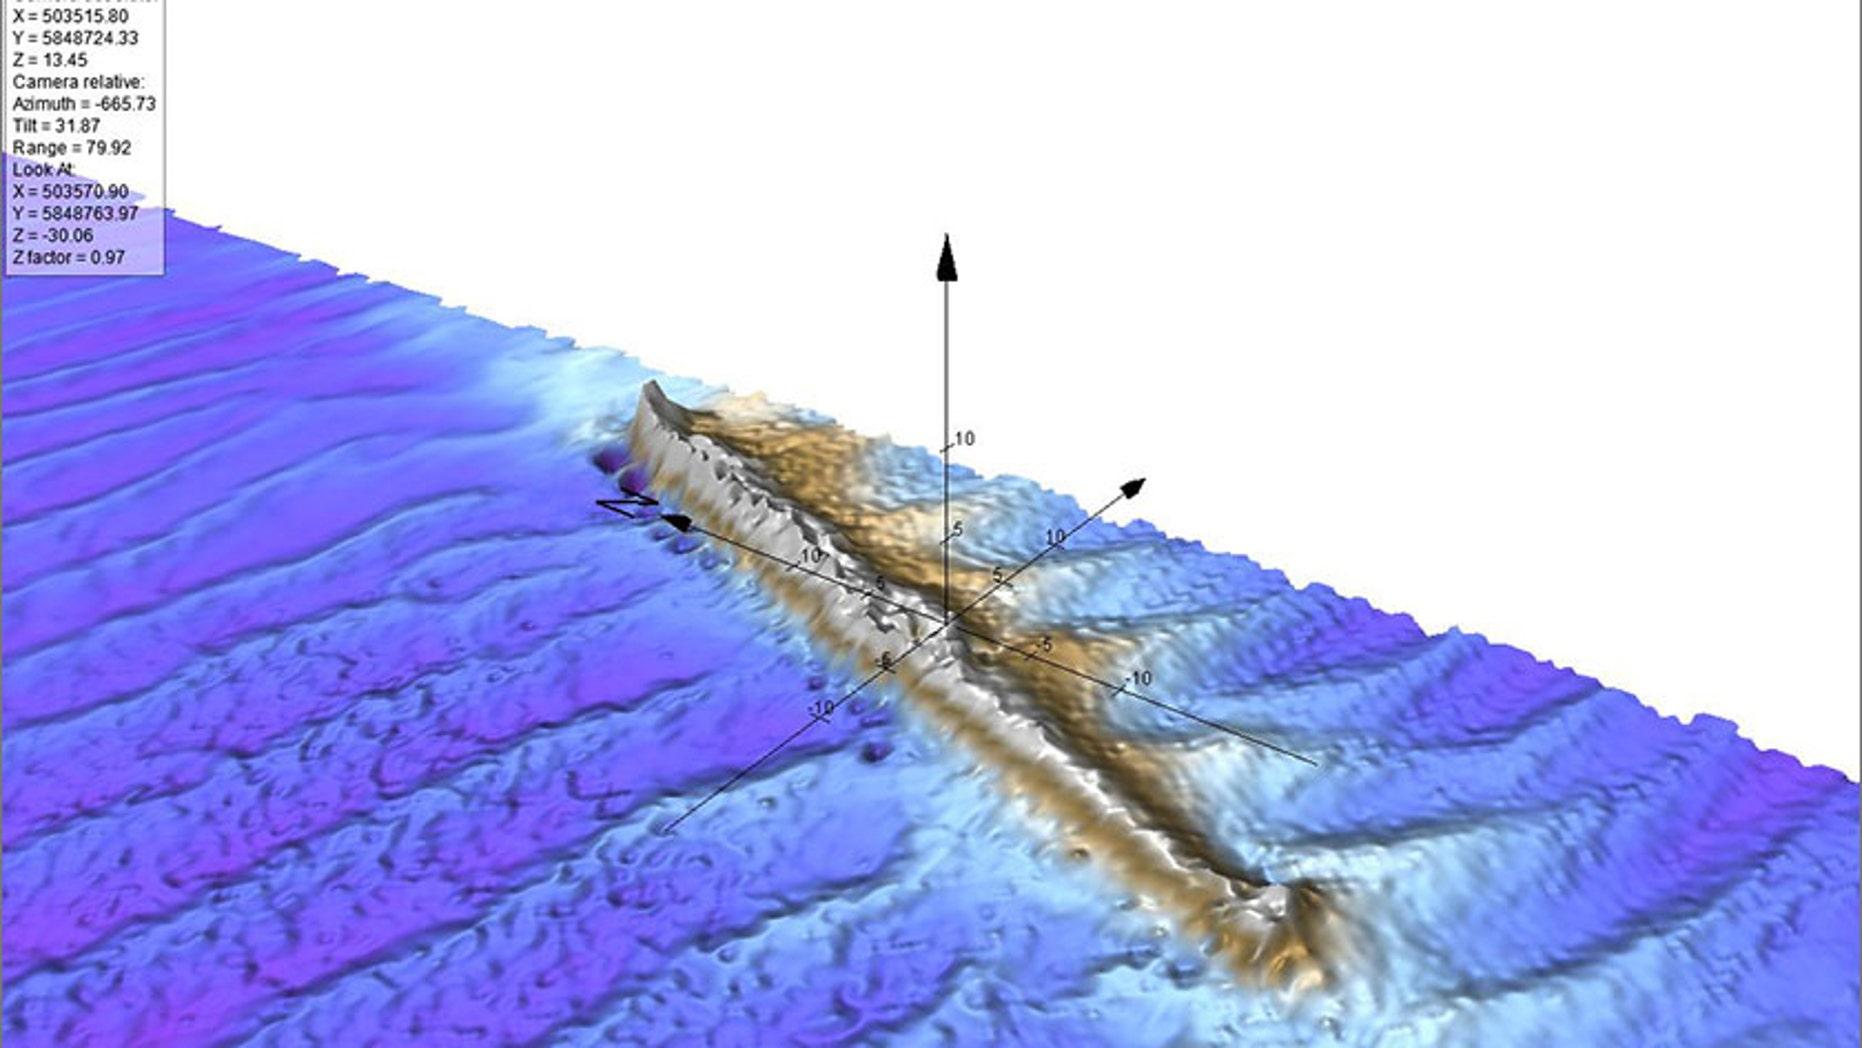 Seabed scan of U-31 wreckage (Credit: Fugro / ScottishPower Renewables)